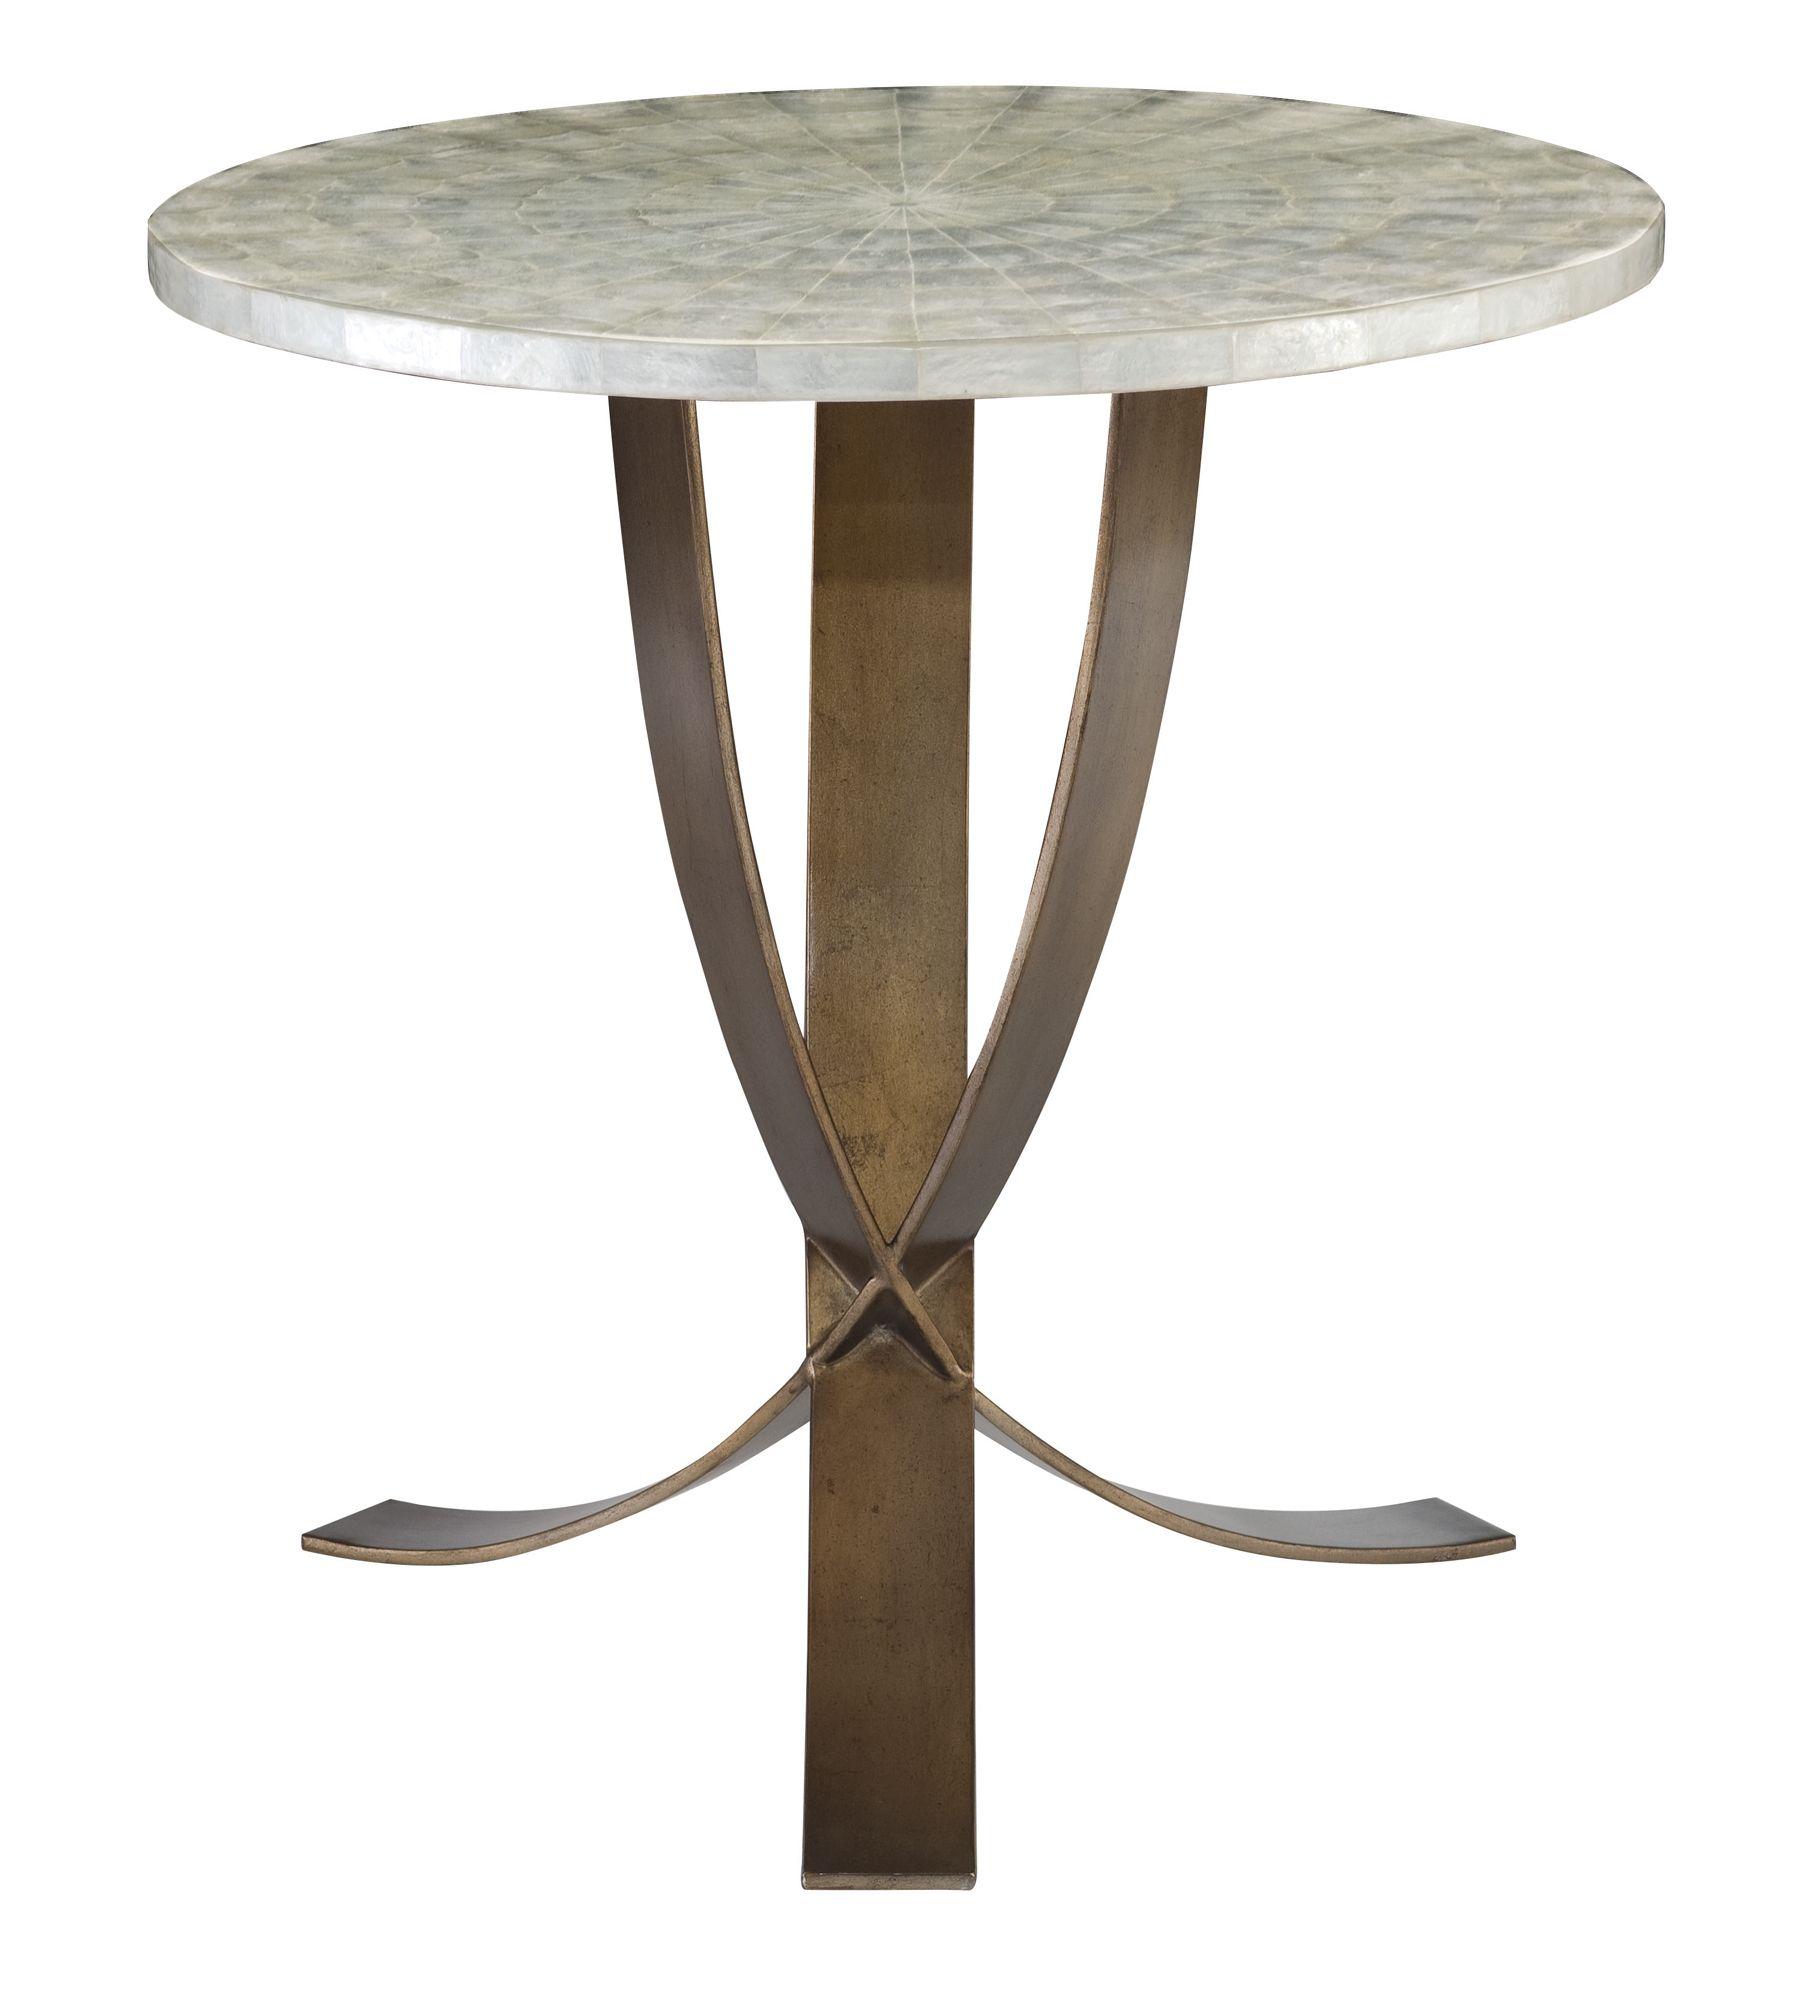 Accent Side Table Accent Side Table Side Table Side Table Design [ 2000 x 1820 Pixel ]